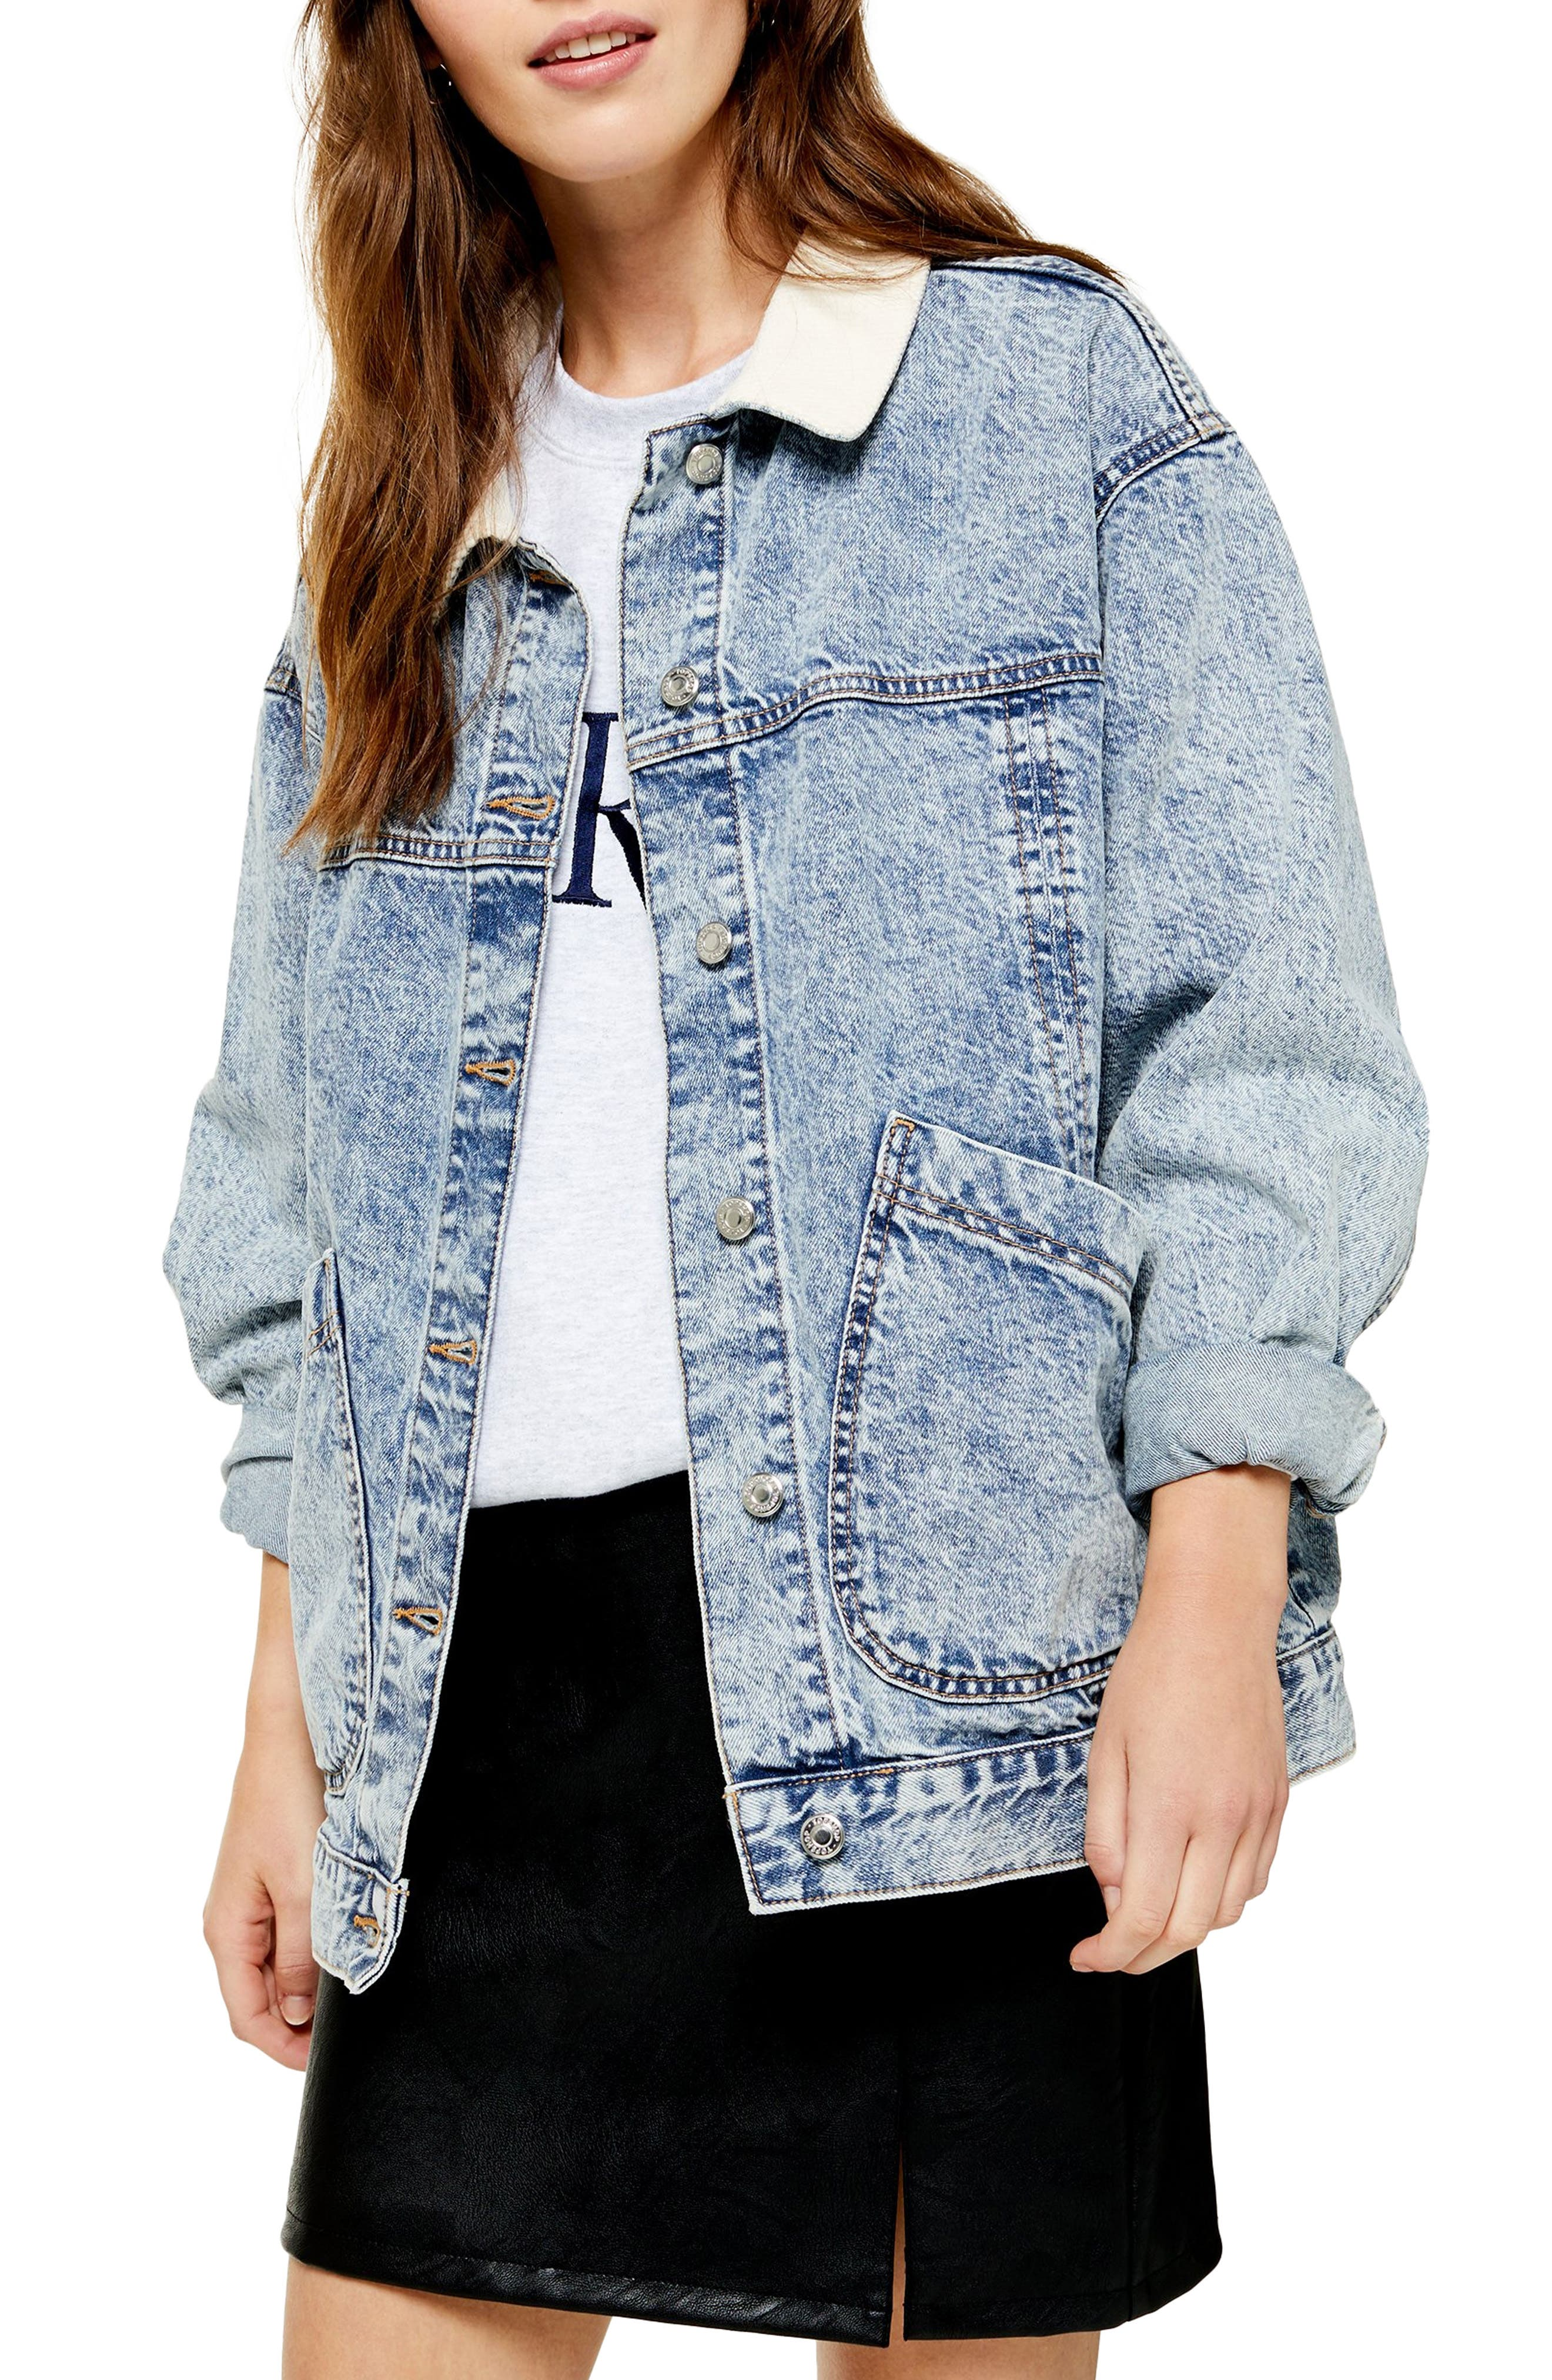 Topshop Cord Collar Patch Denim Jacket